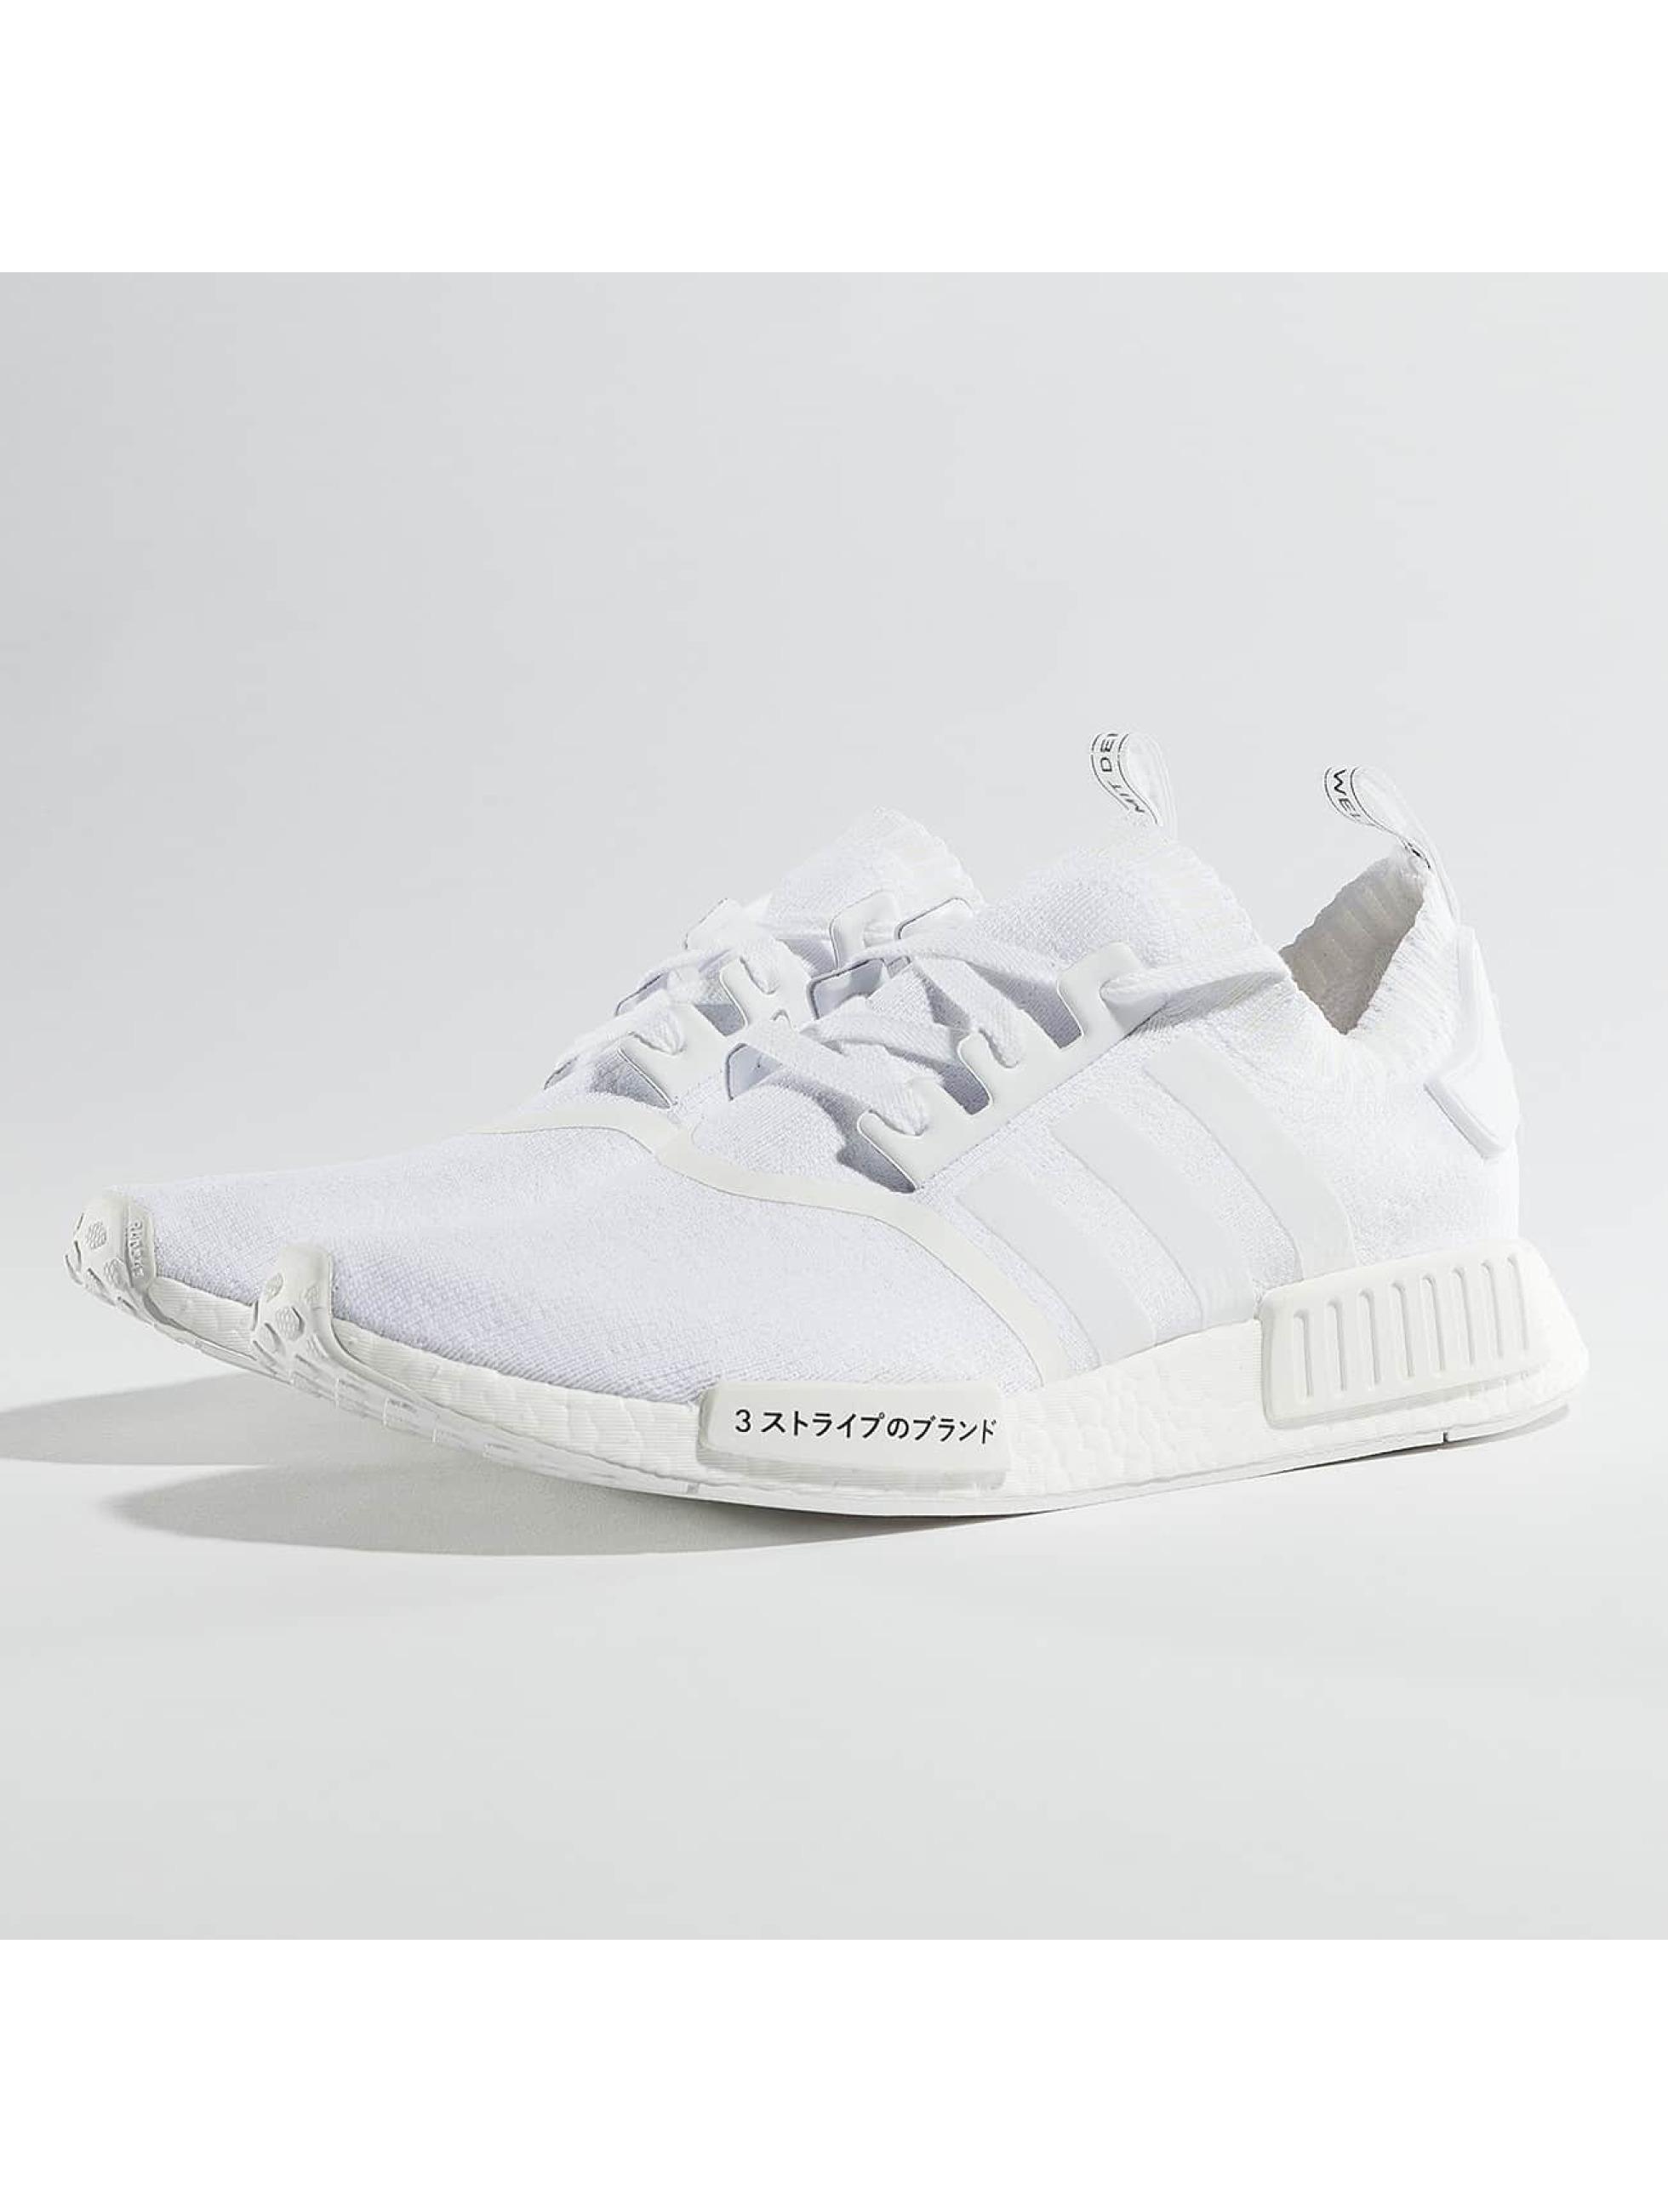 adidas Sneakers NMD_R1 PK white